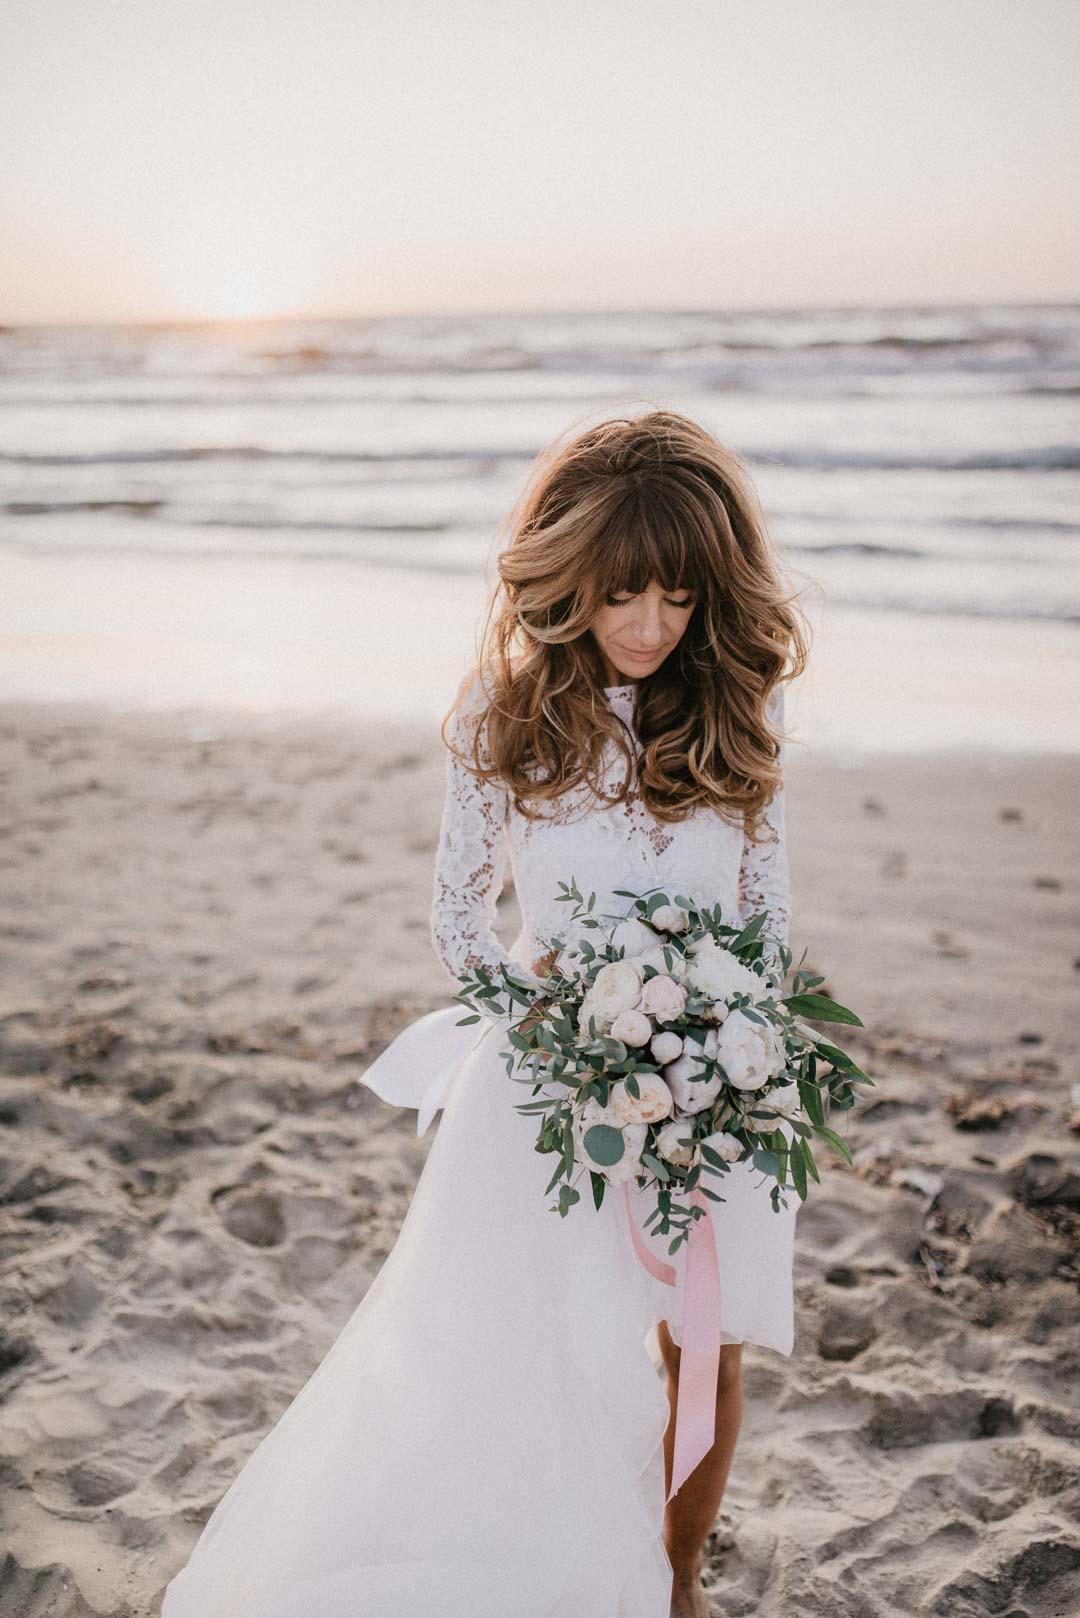 wedding-photographer-destination-fineart-bespoke-reportage-napoli-nabilah-vivianeizzo-spazio46-141